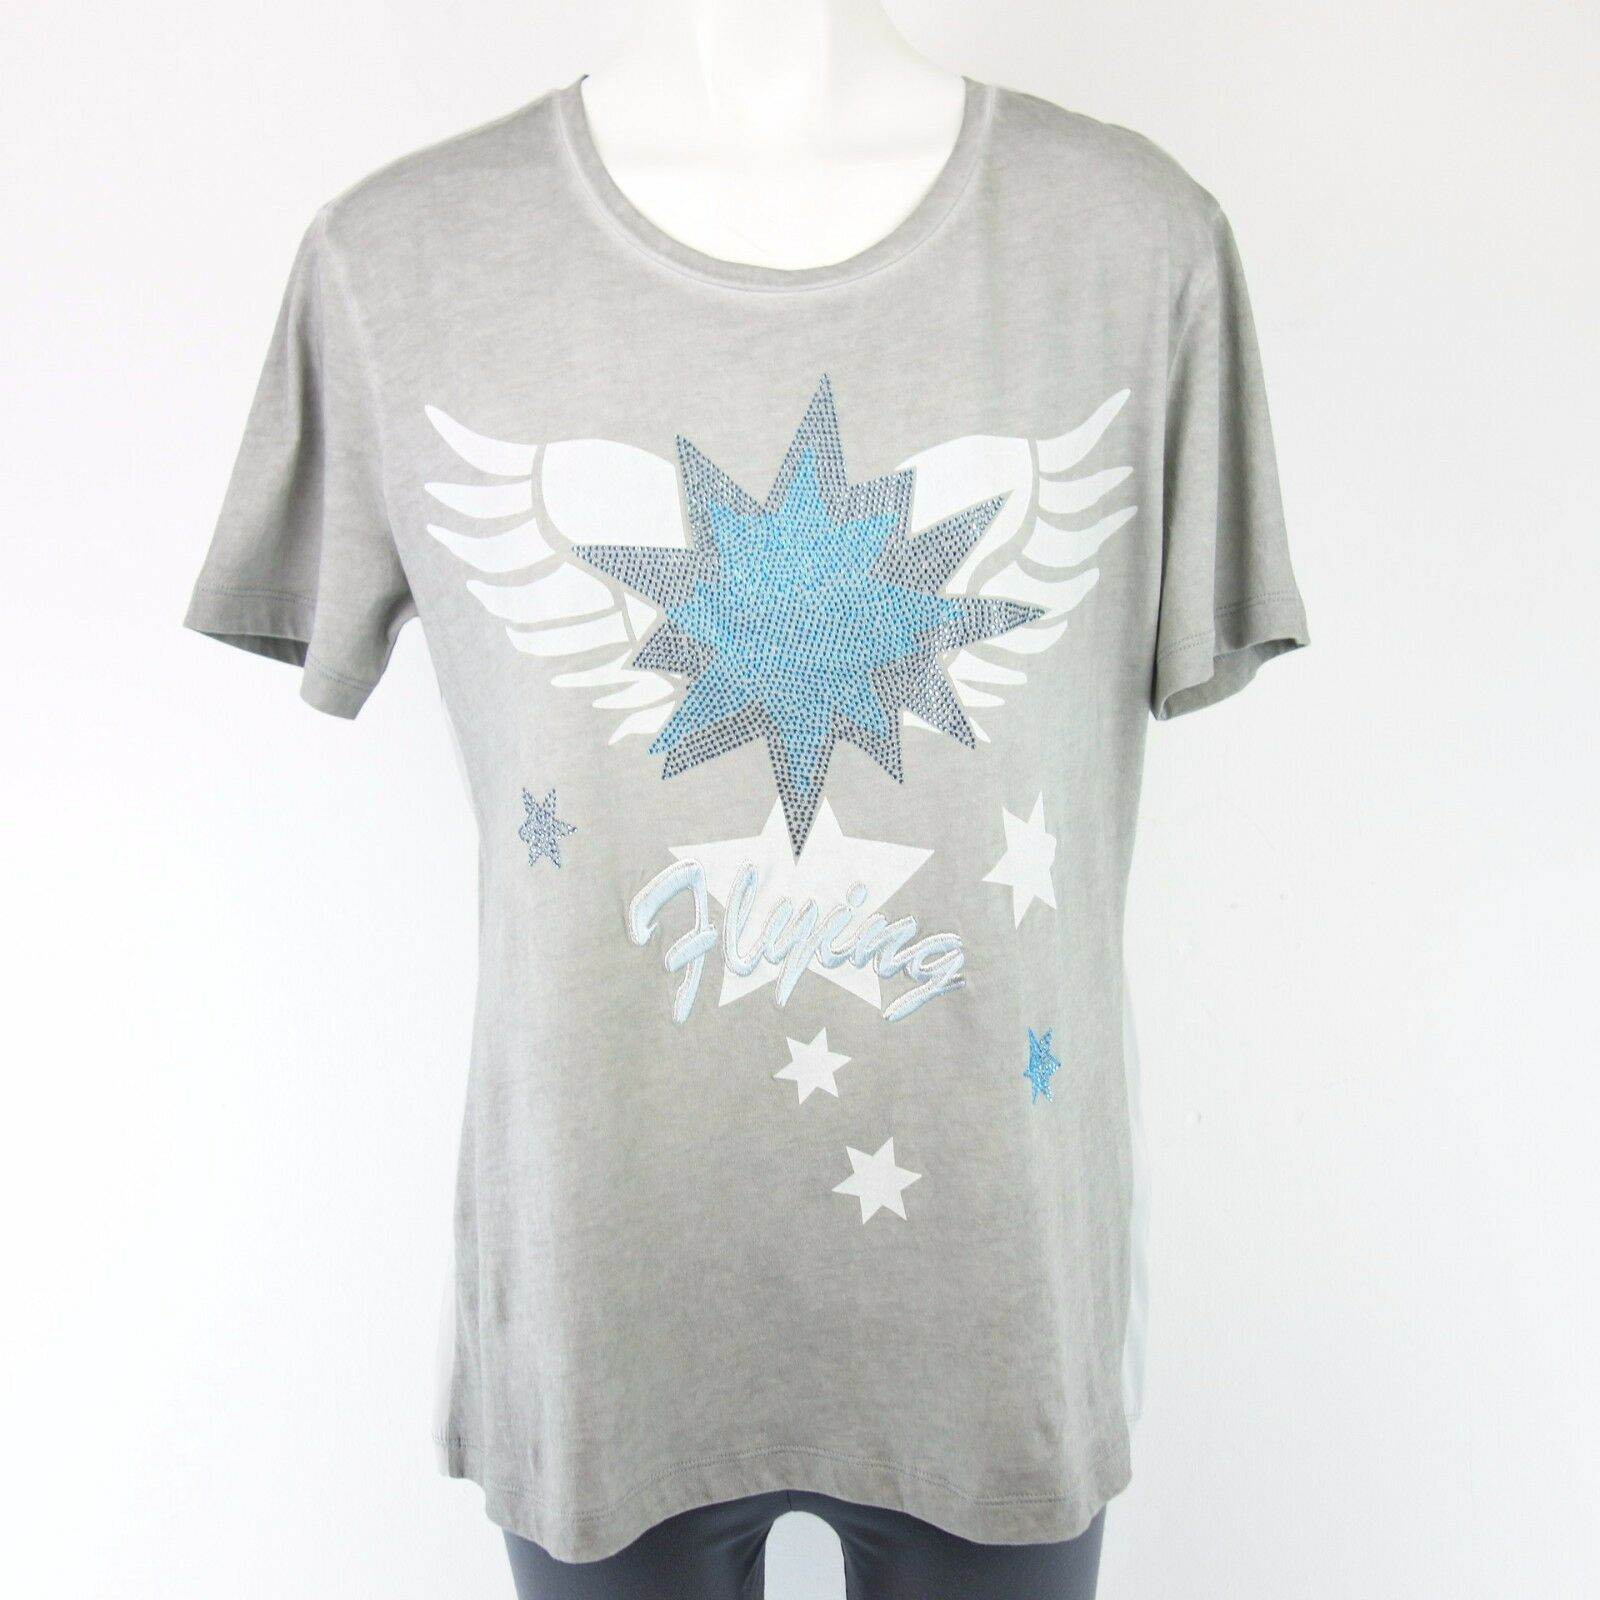 NICE CONNECTION Damem Shirt Gr 40 Grau Straß Stern Baumwolle Seide NP 159 NEU